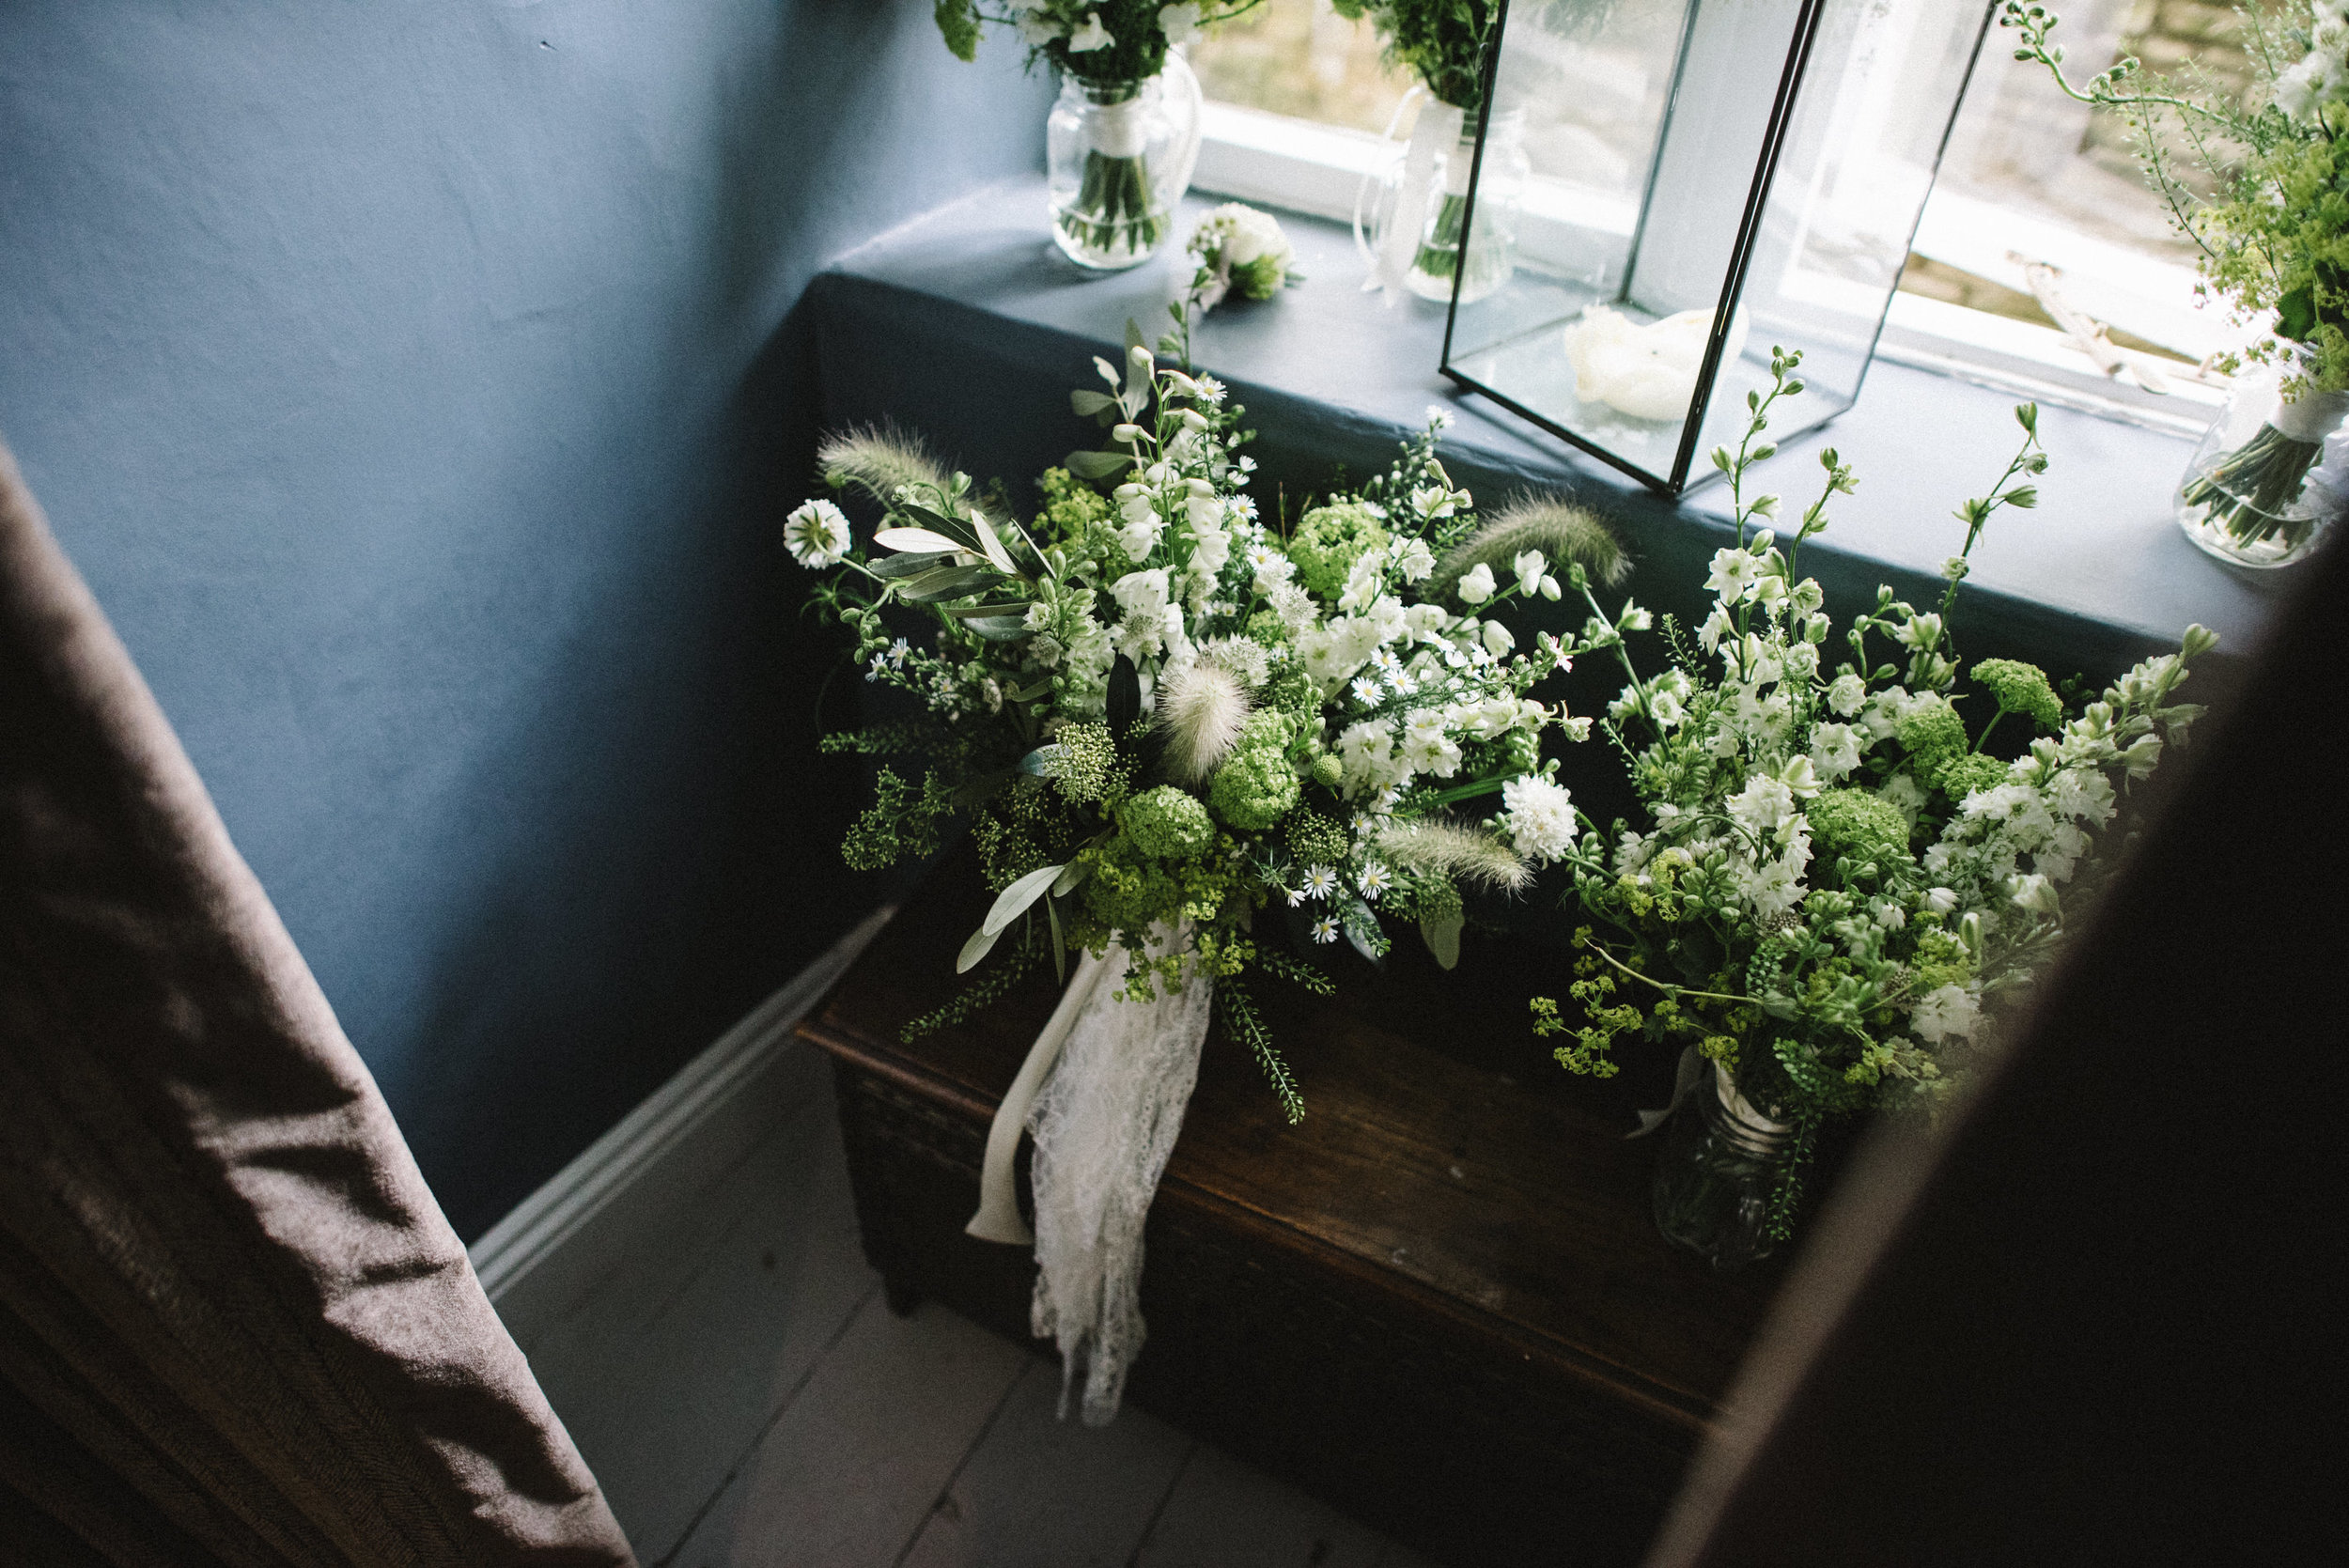 0194-LISA-DEVINE-PHOTOGRAPHY-ALTERNATIVE-WEDDING-PHOTOGRAPHY-SCOTLAND-DESTINATION-WEDDINGS-GLASGOW-WEDDINGS-COOL-WEDDINGS-STYLISH-WEDDINGS.JPG